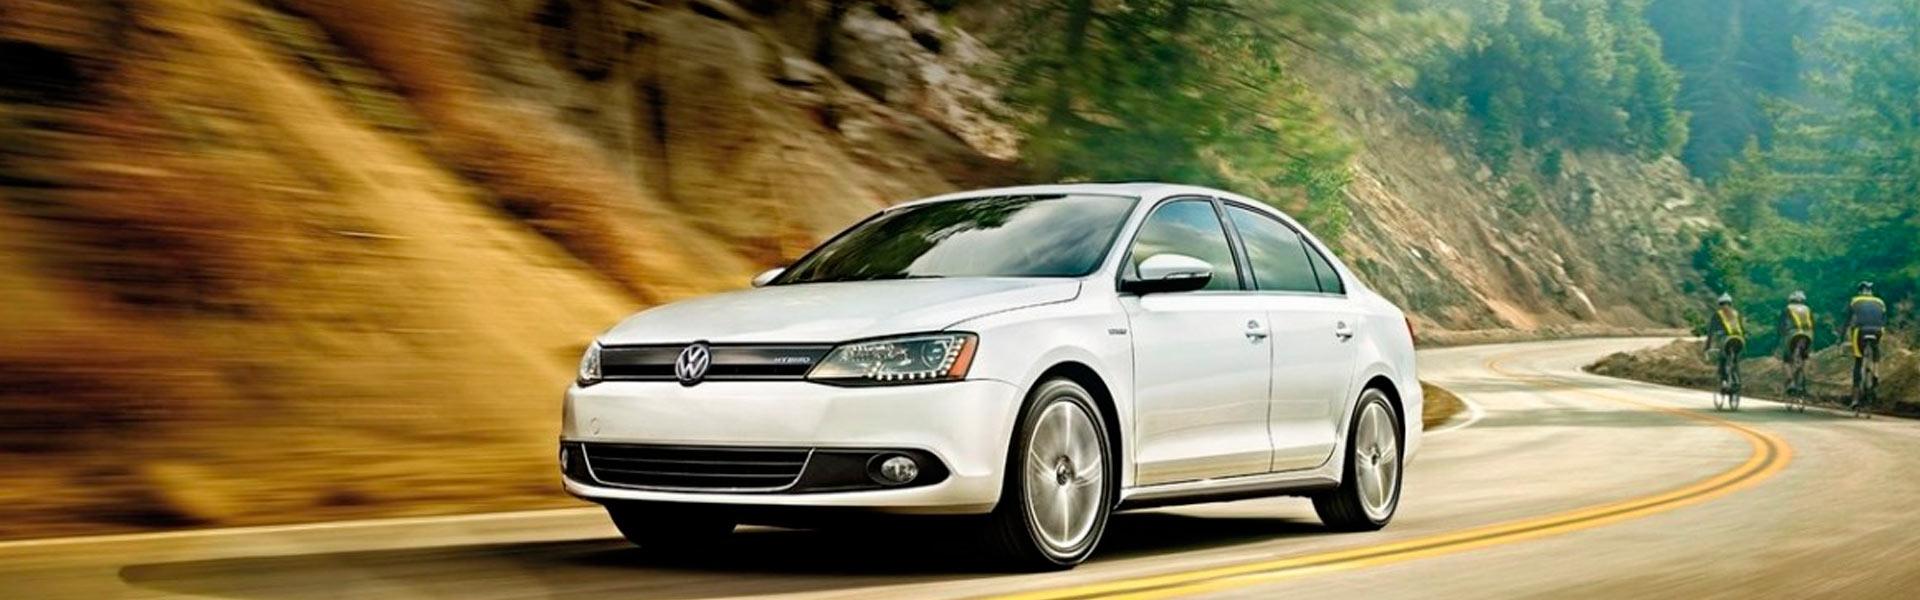 Запчасти на Volkswagen Jetta